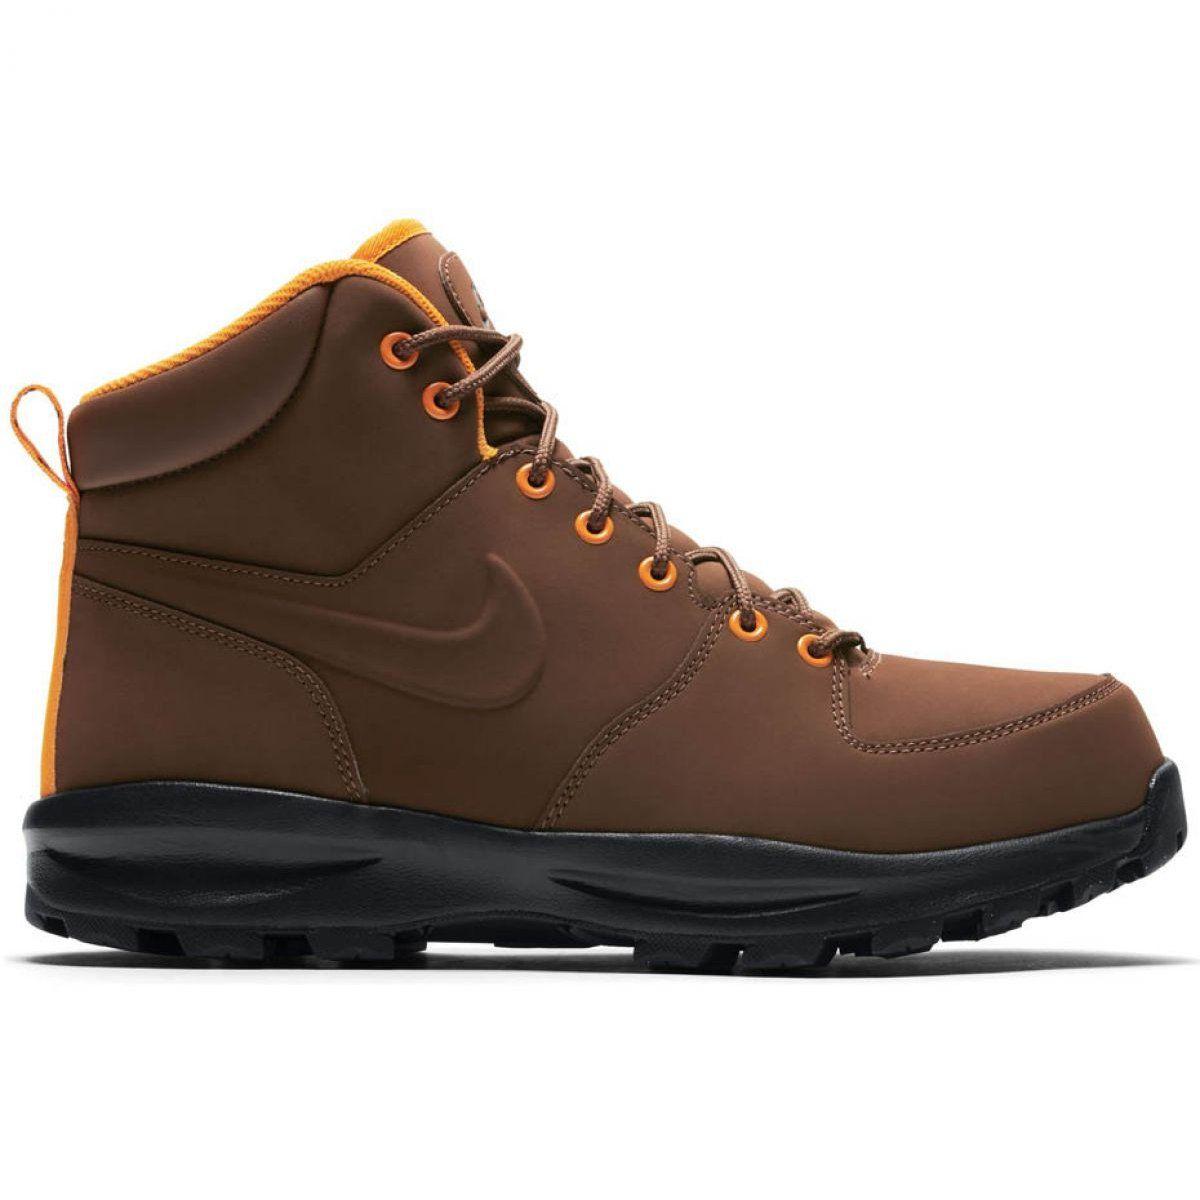 Buty Nike Manoa Leather M 454350 203 Brazowe Shoes Nike Adidas Trending Shoes Nike Shoes